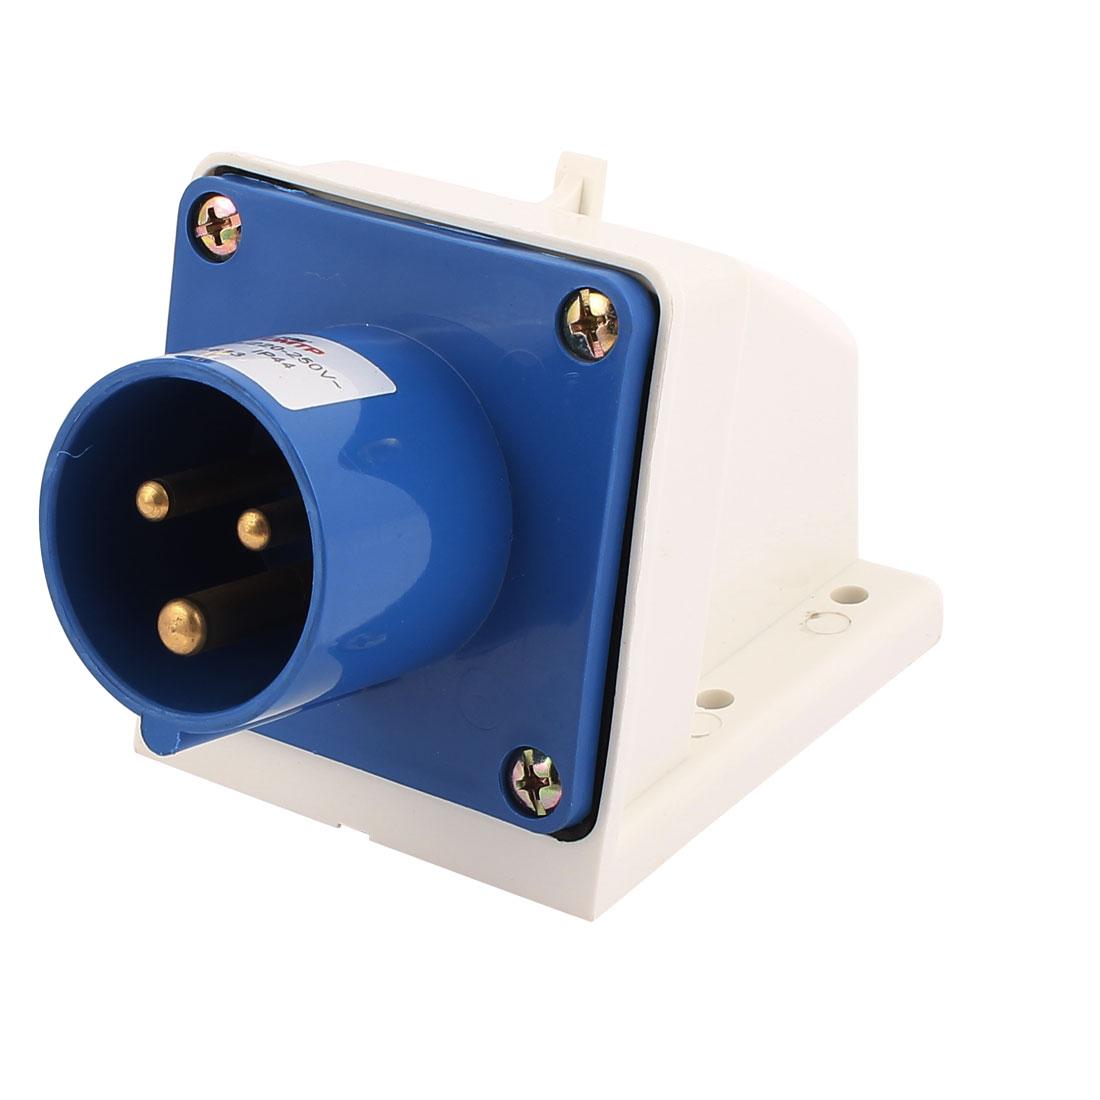 AC 220V-250V 16A IP44 2P+E 3-Terminal Male Industrial Caravan Panel Plug